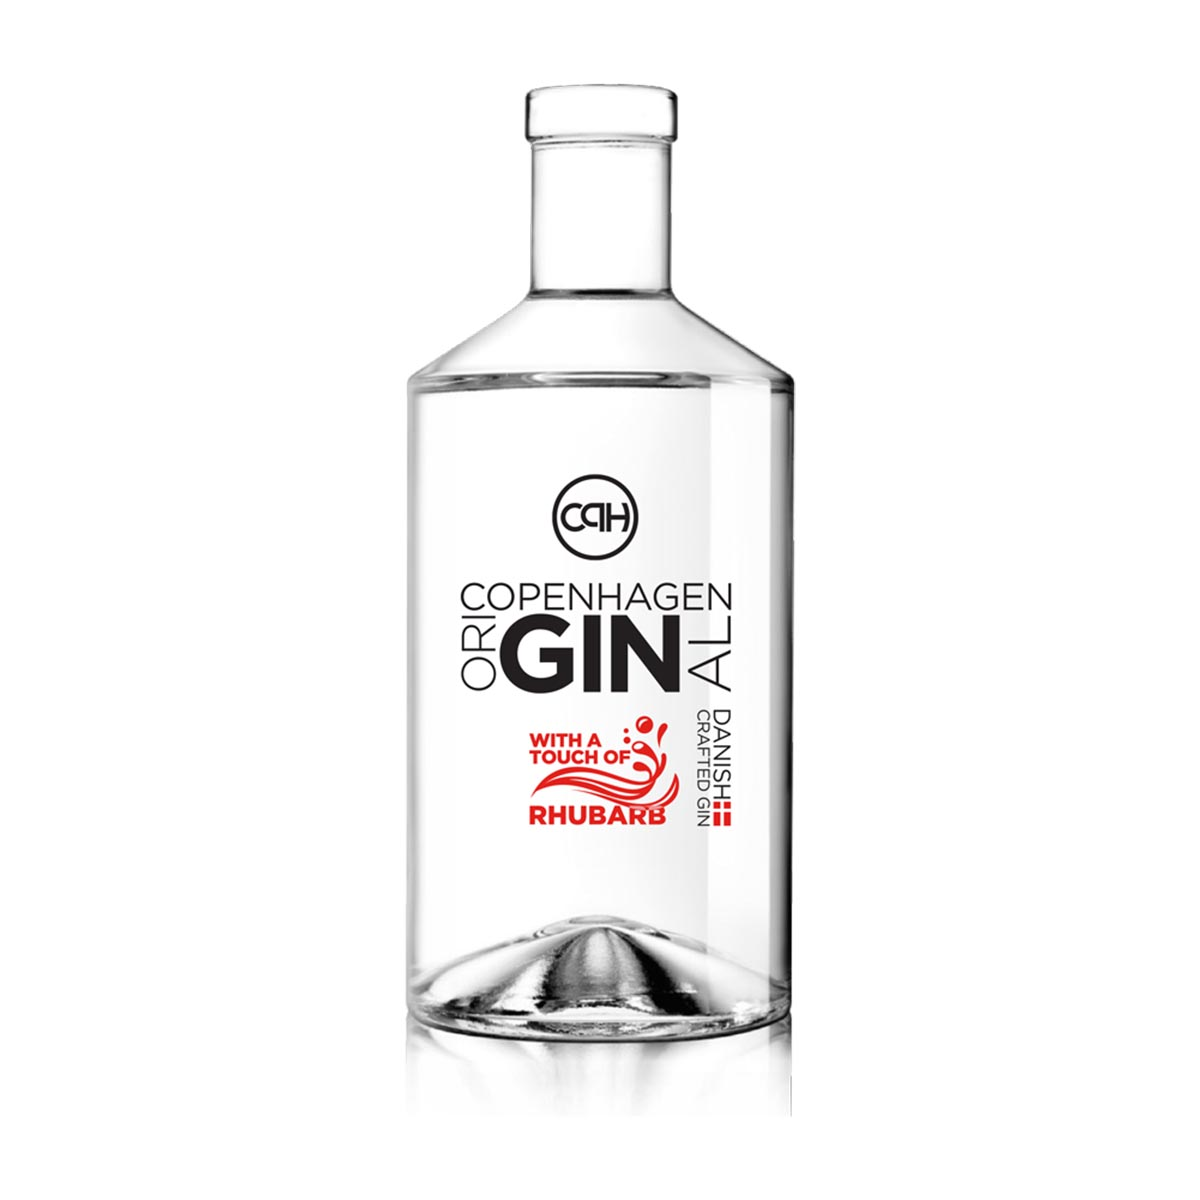 CPH oriGinal gin Rhubarb